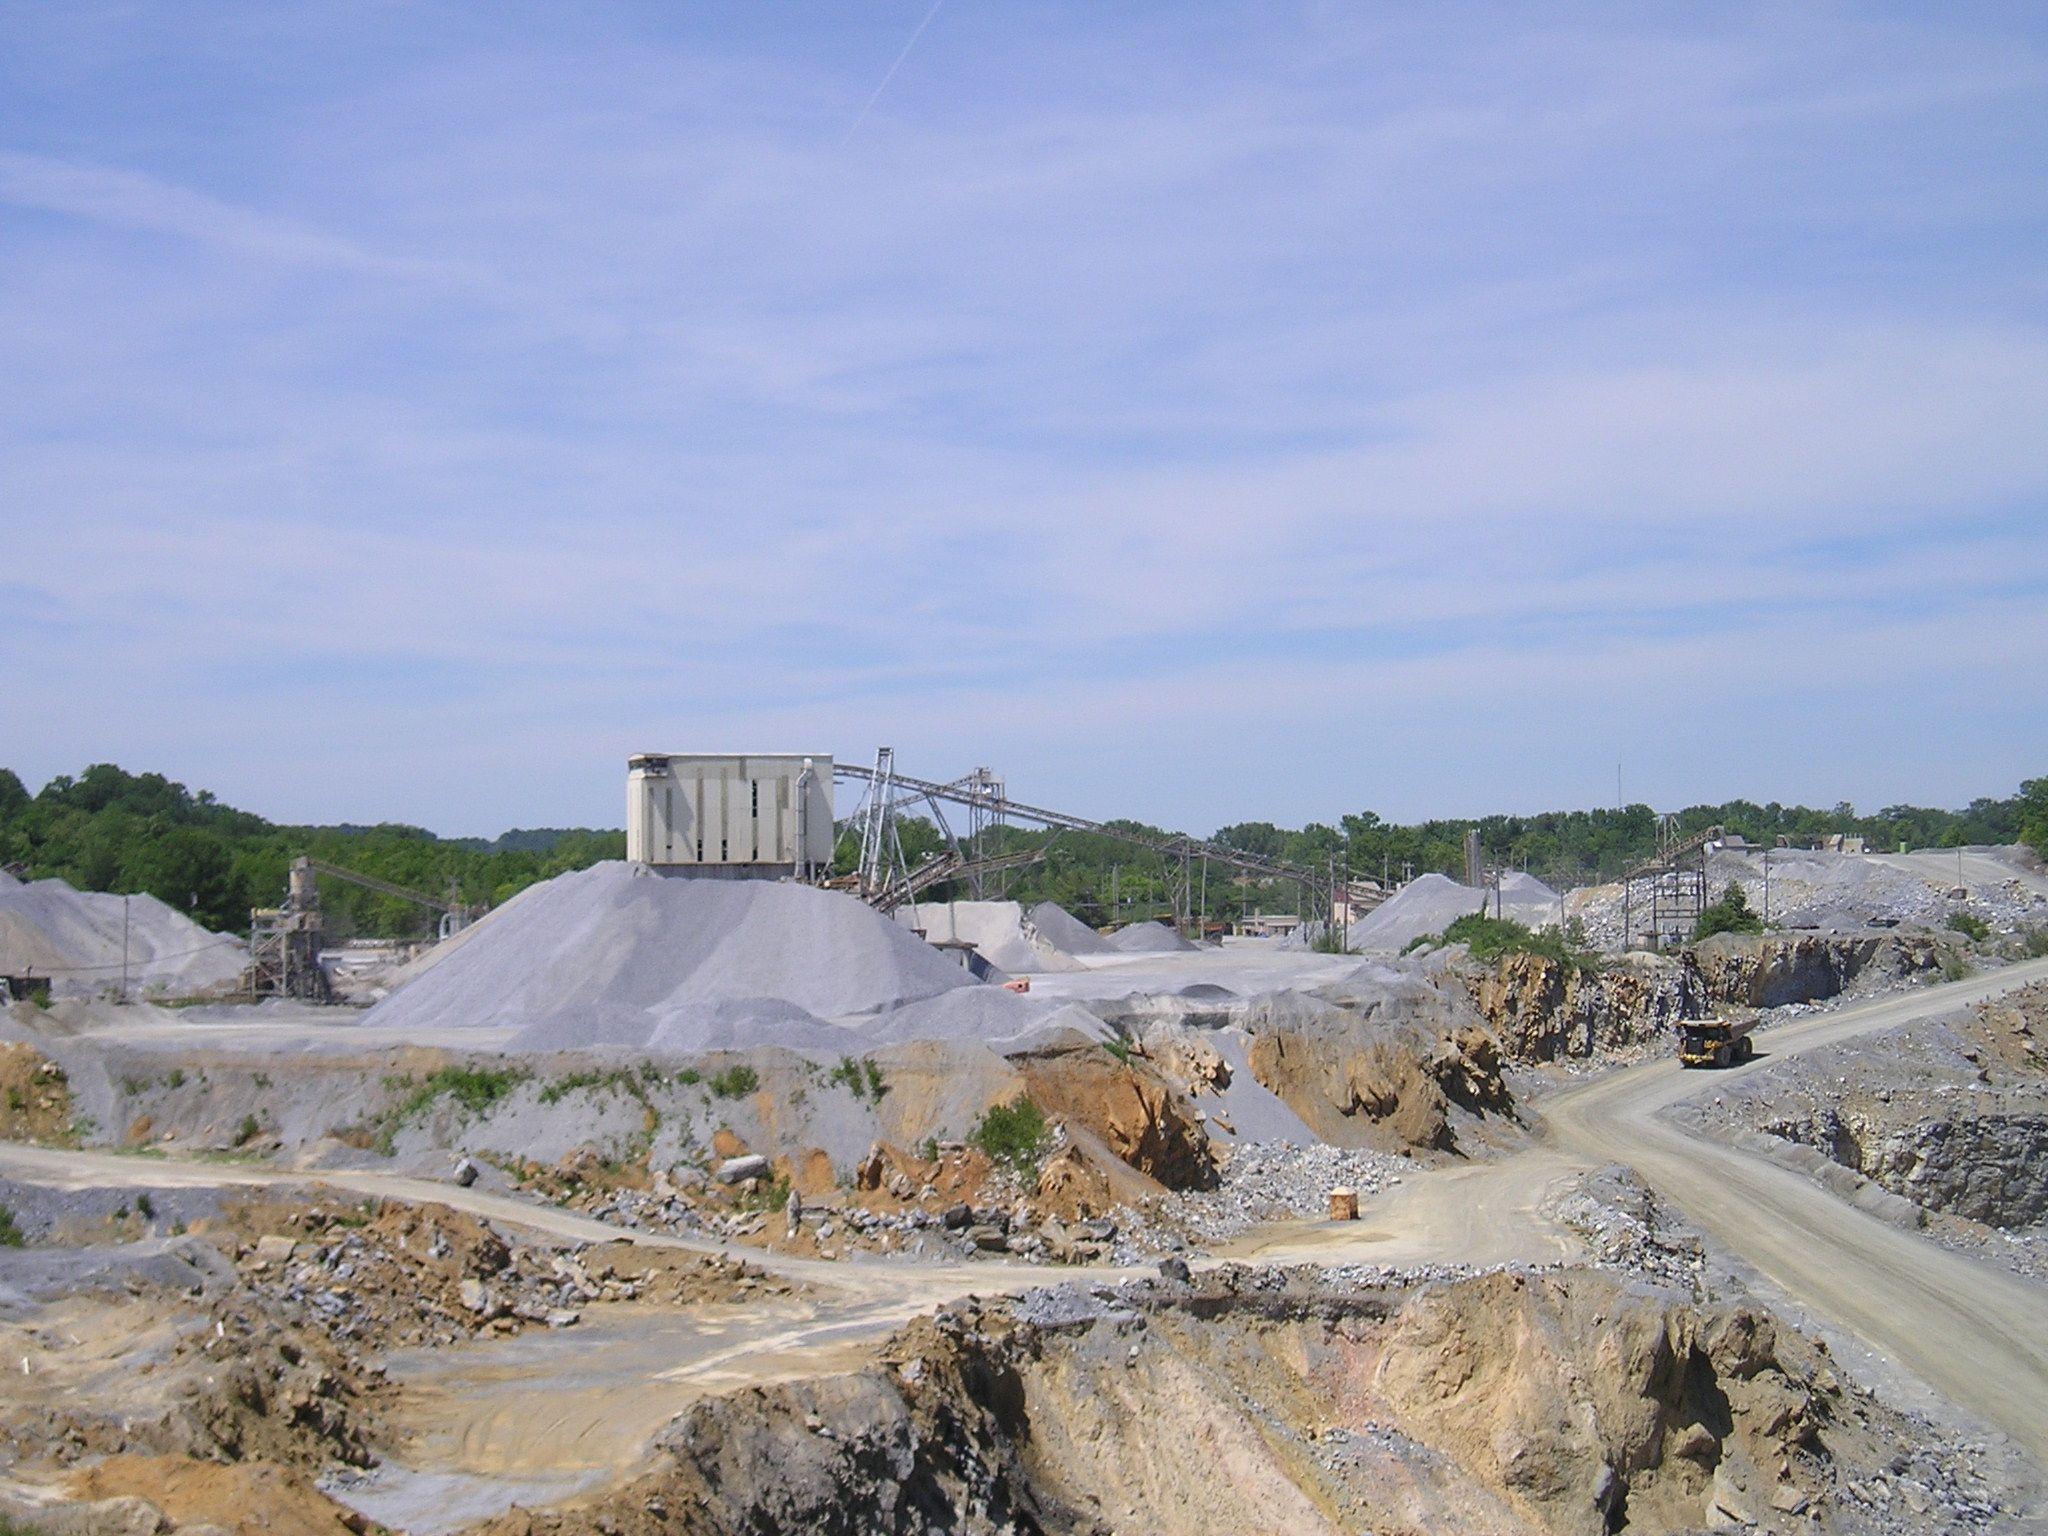 Lehigh Hanson's aggregate plant in Downingtown, Pennsylvania